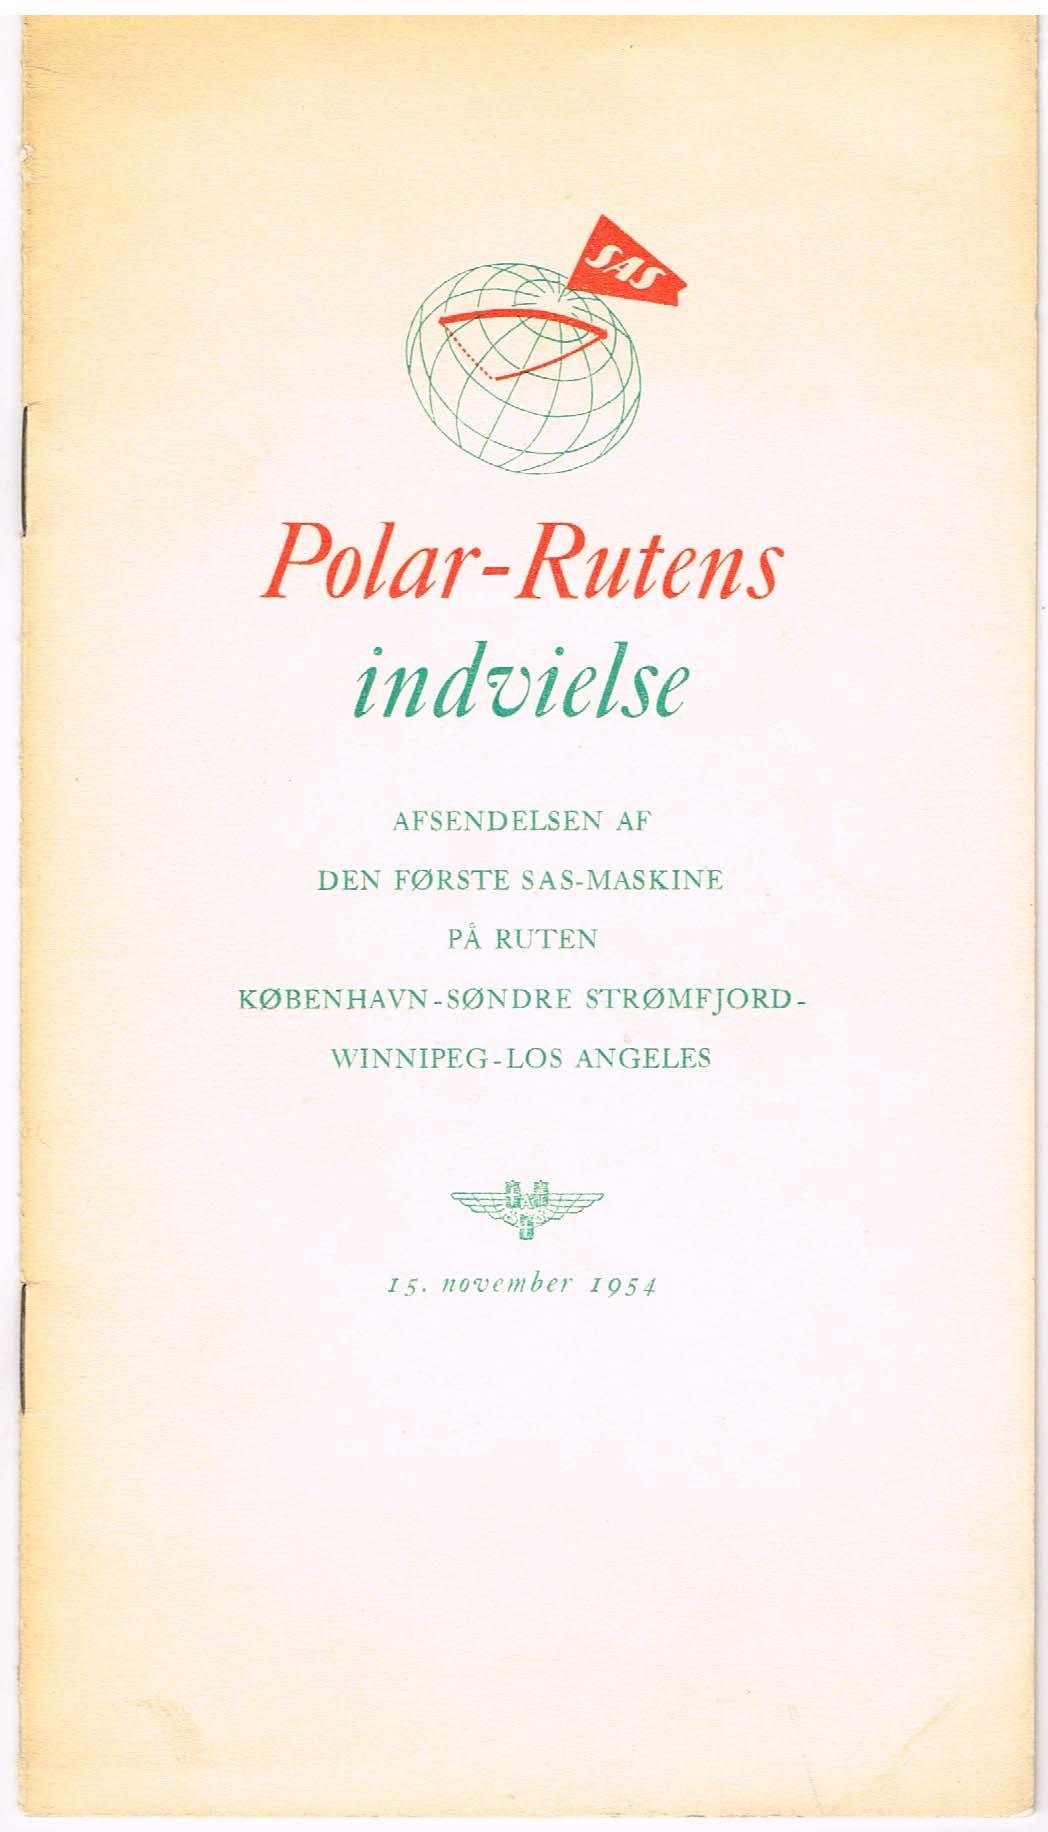 polar-rutens indvielse 1954